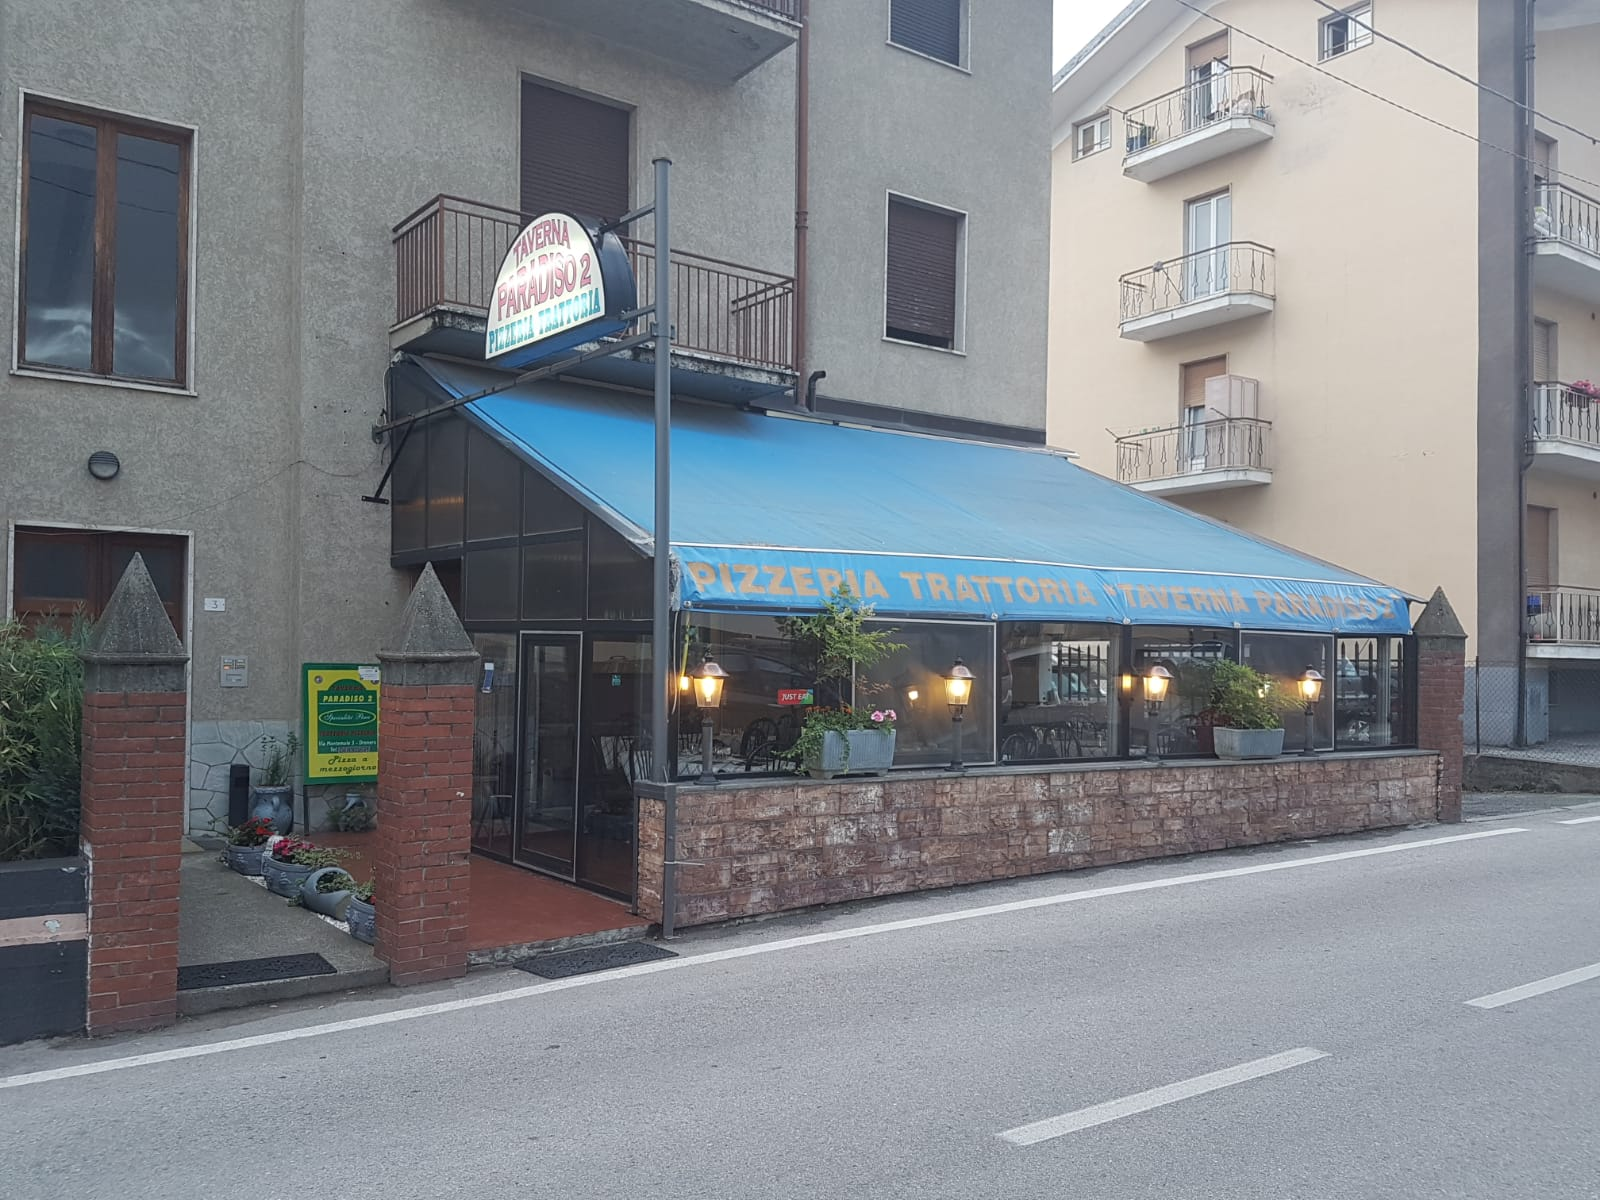 Pizzeria Trattoria Taverna Paradiso 2